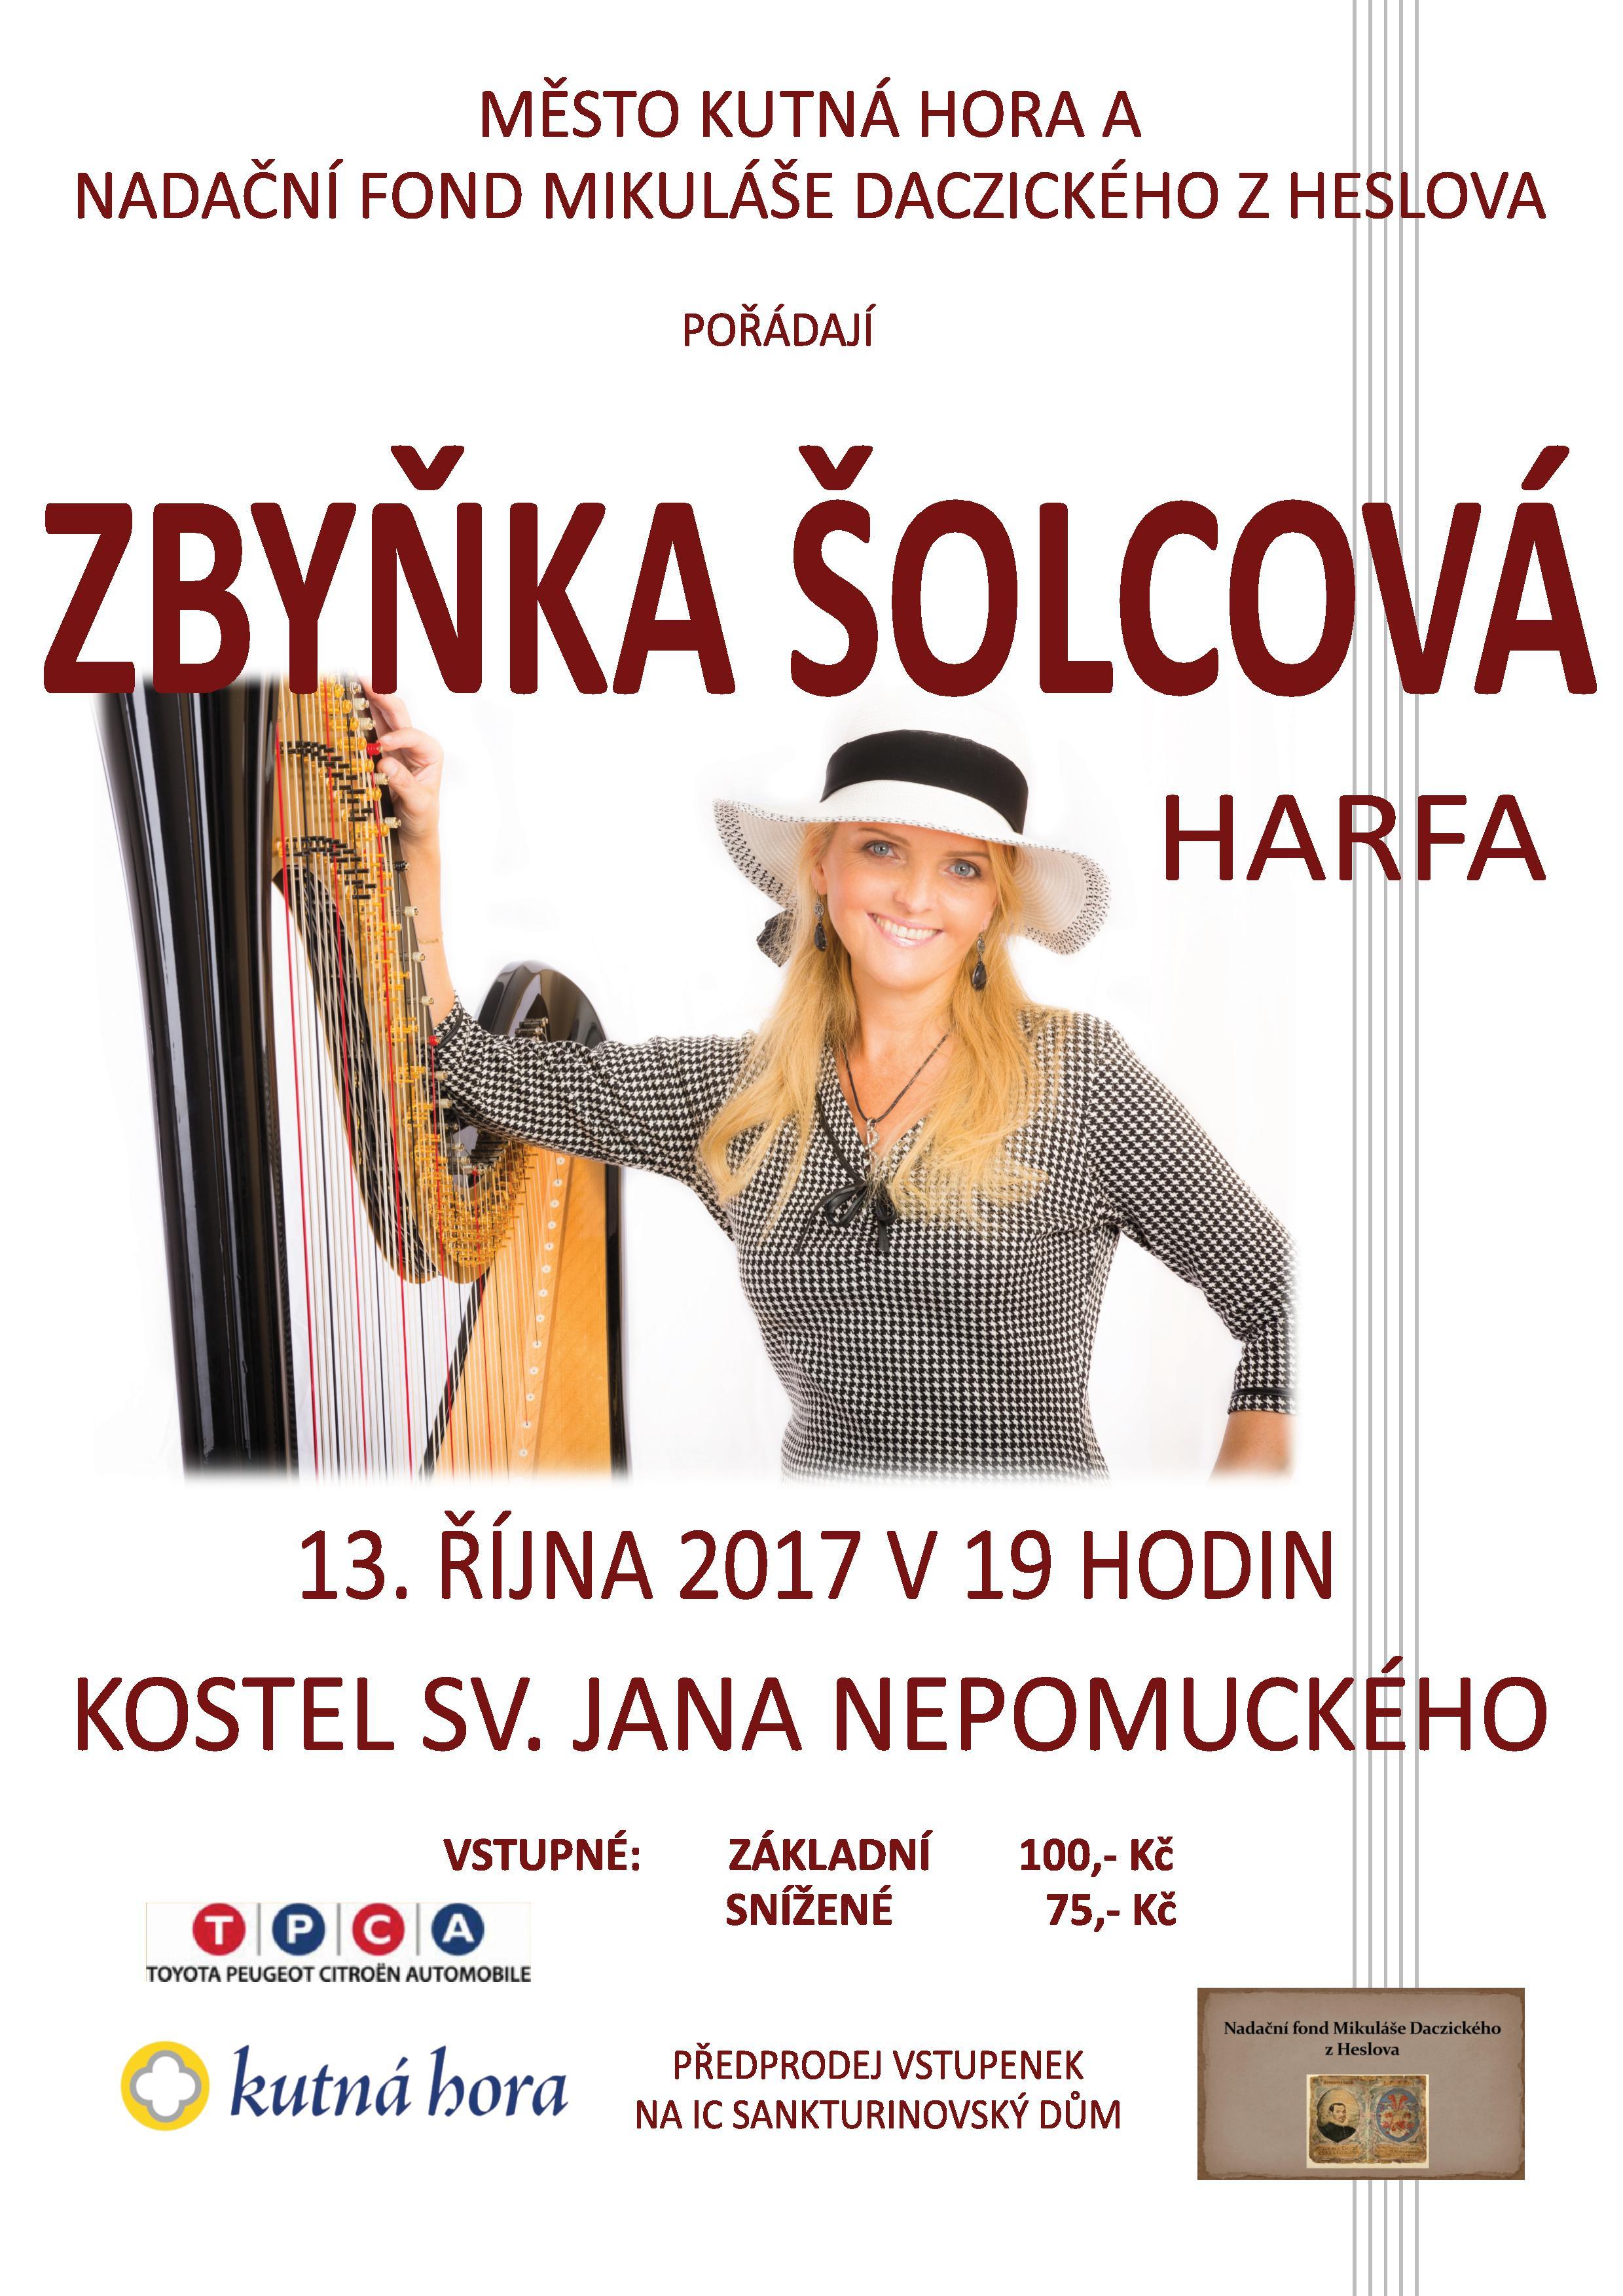 2648-harfa-a4-novy.jpg